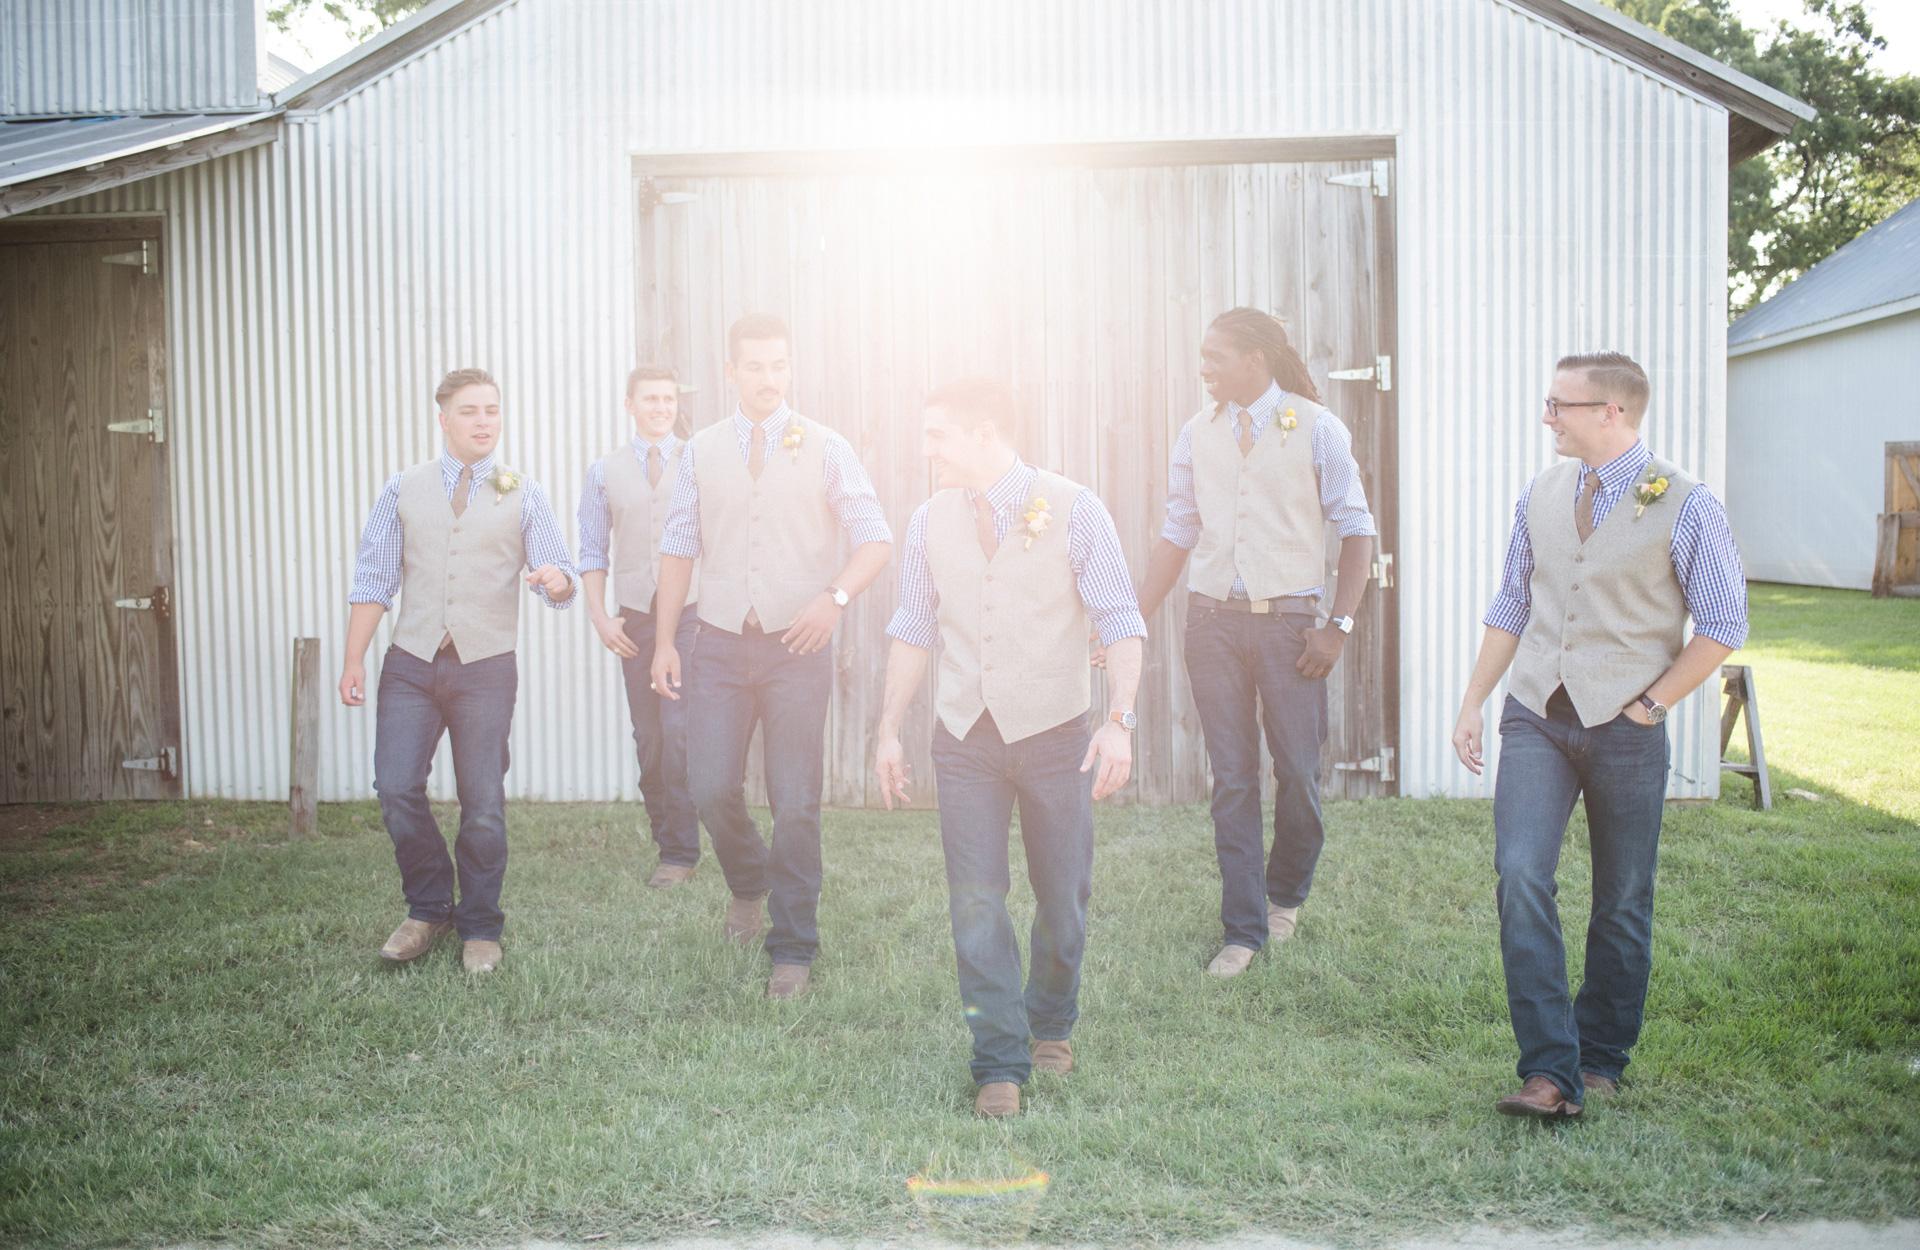 Amish Barn at Edge, Texas | Premier wedding and event venue